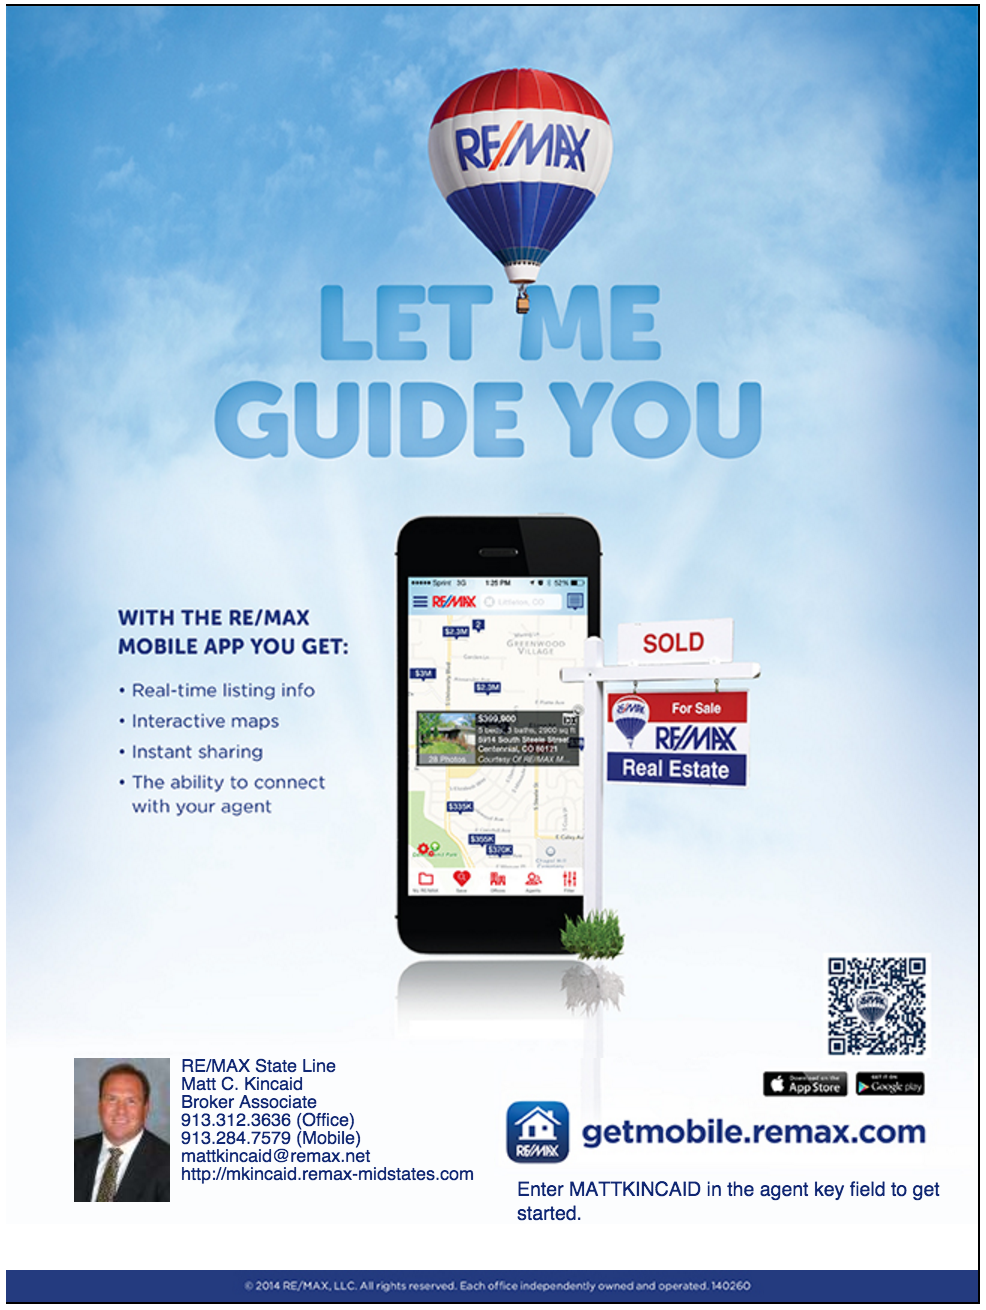 RE/MAX Mobile App - Matt Kincaid Real Estate